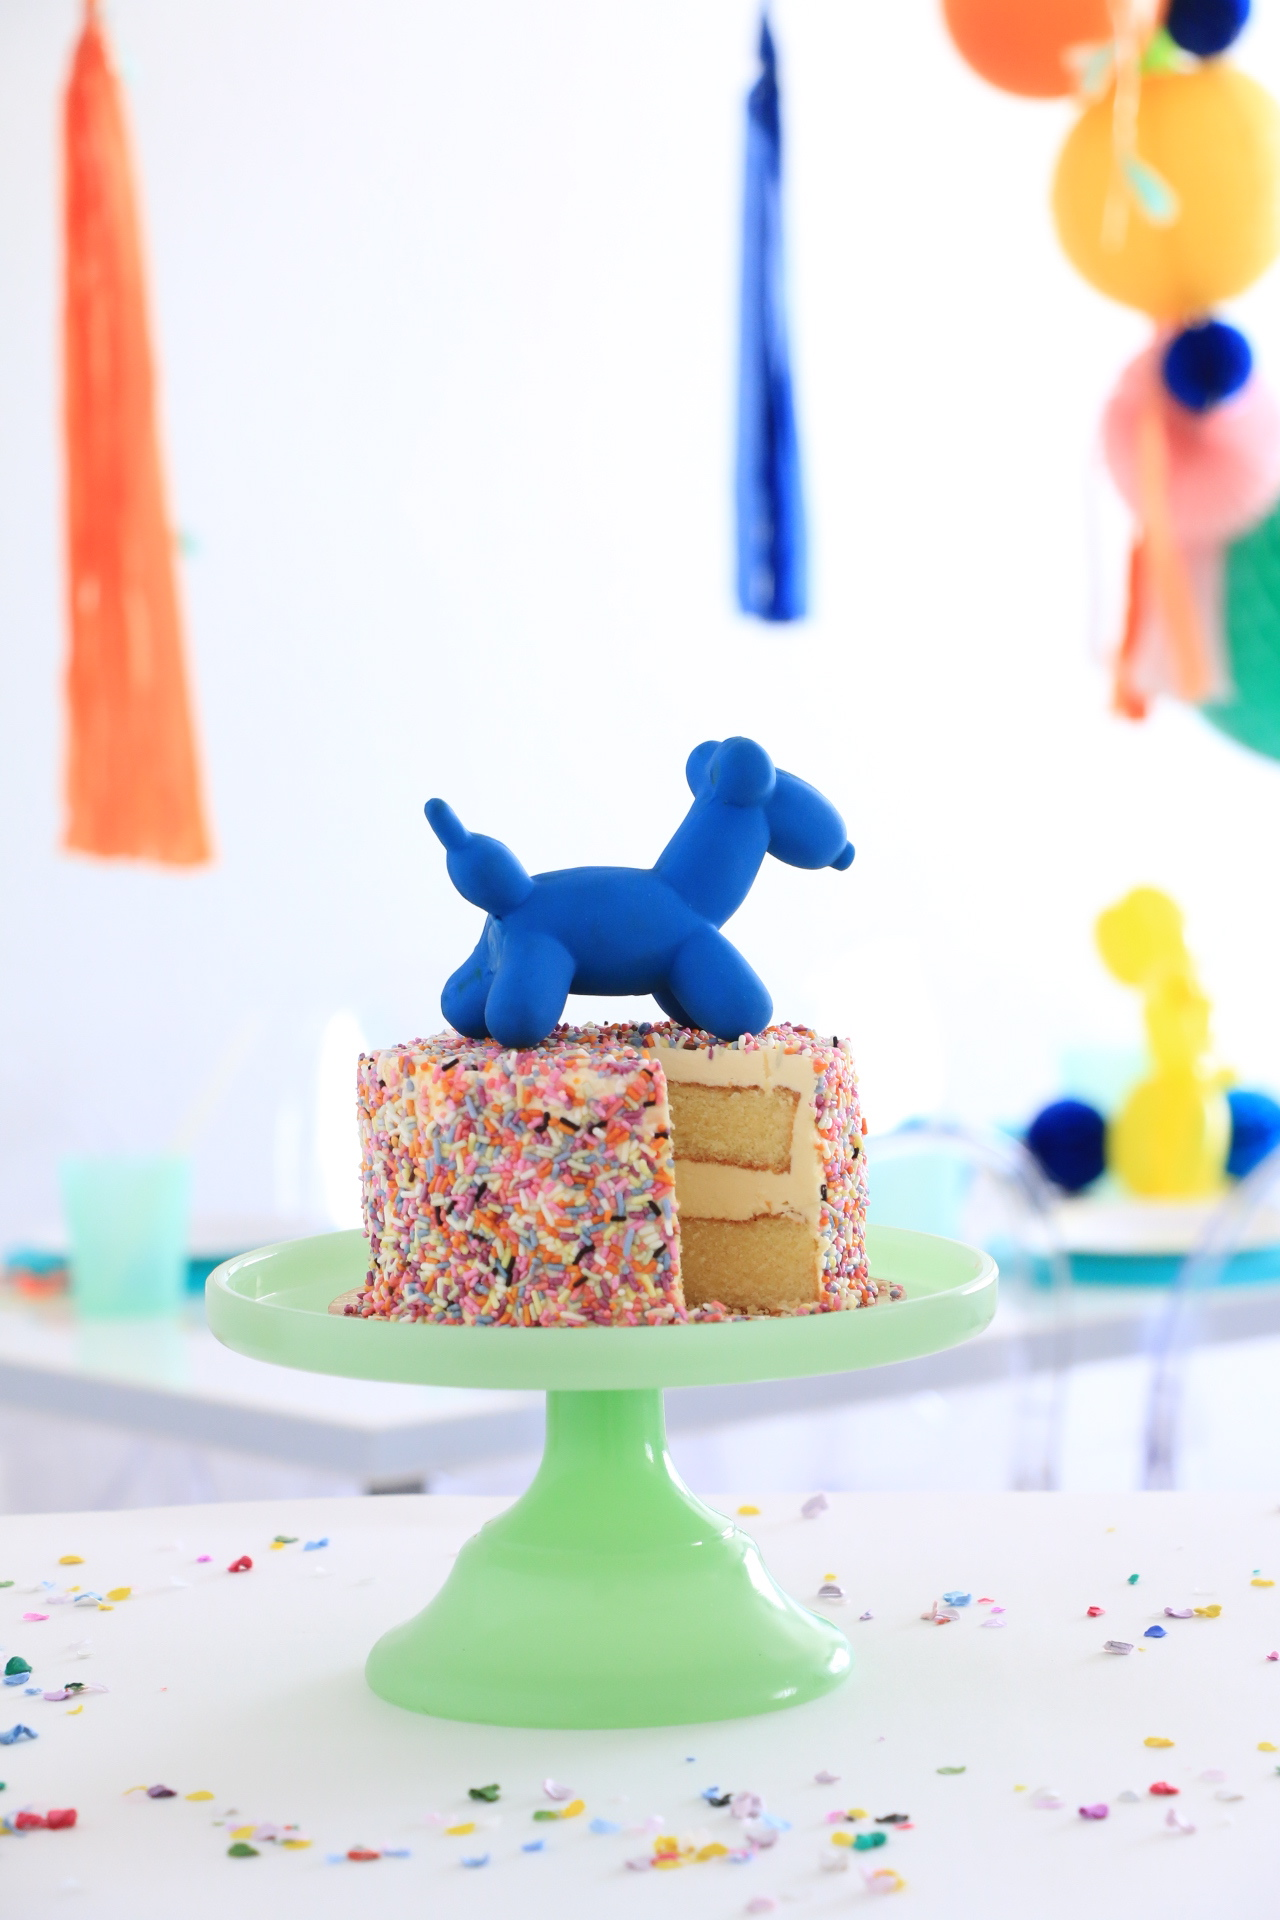 Jeff_kuntz_Balloon_Animal_Cake_Anthony_and_Stork.jpg